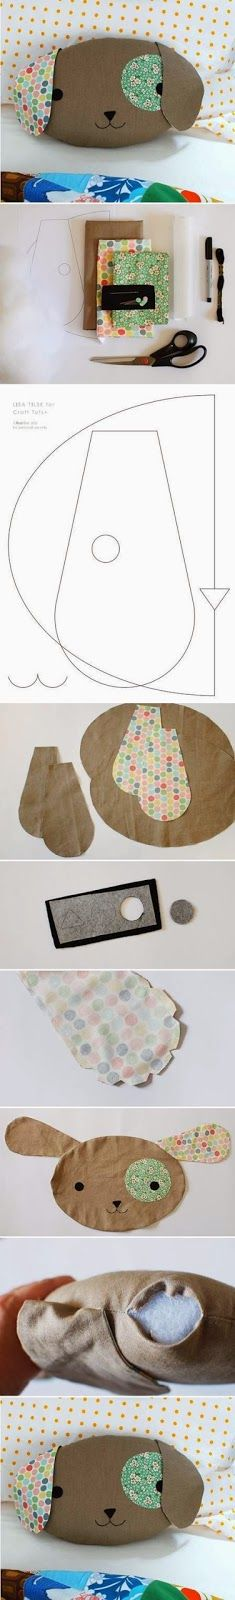 ❣ Little Kimono Handmade ❣ : DIY Cojín de Cachorro